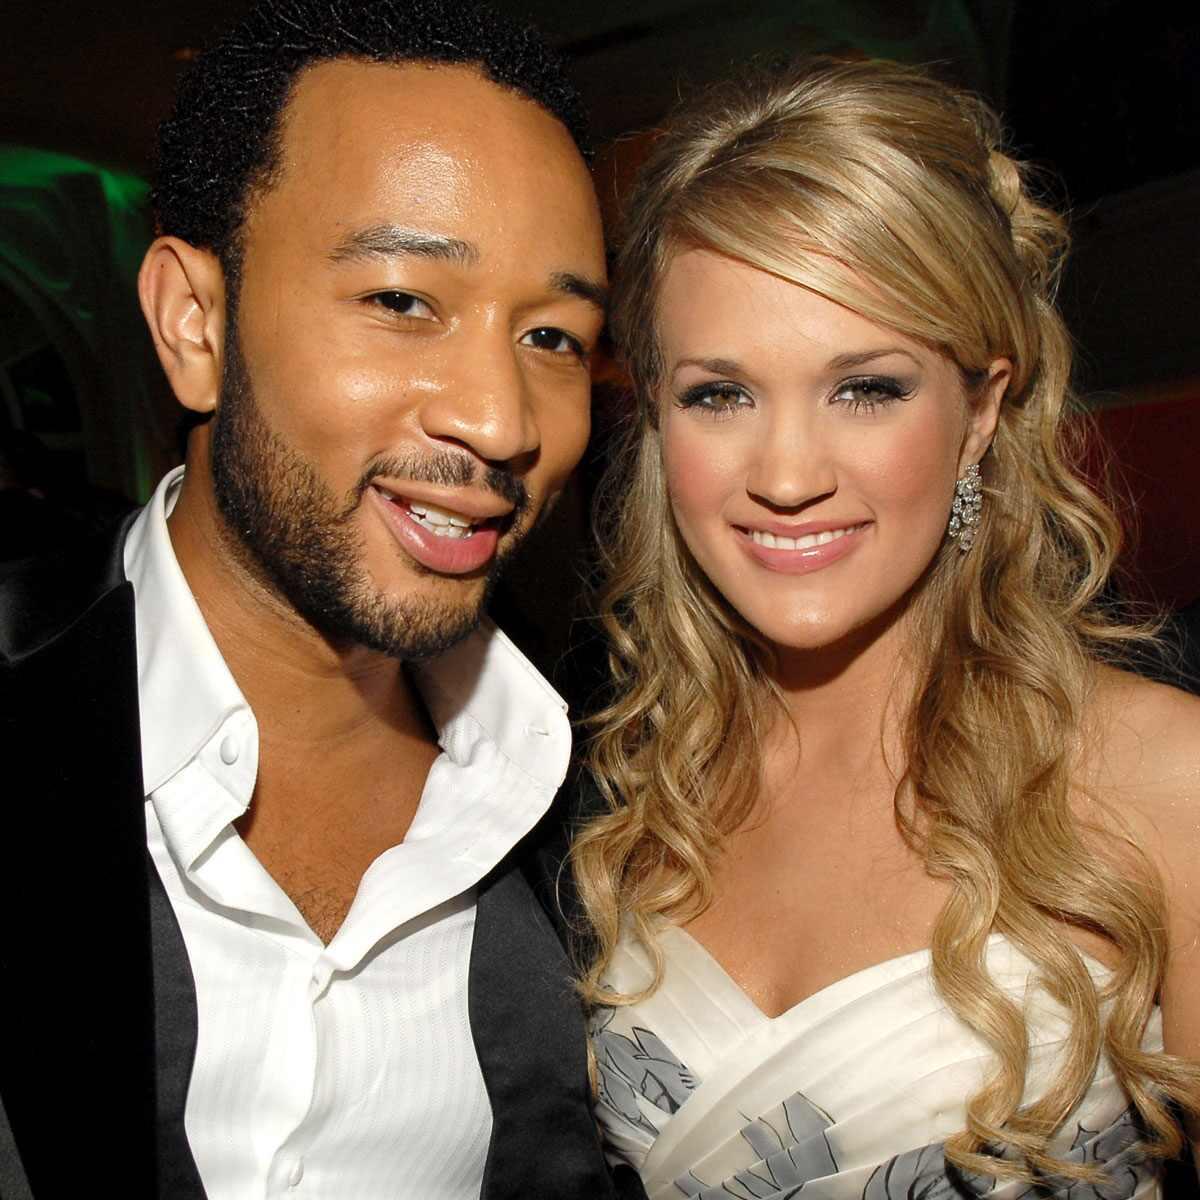 John Legend, Carrie Underwood